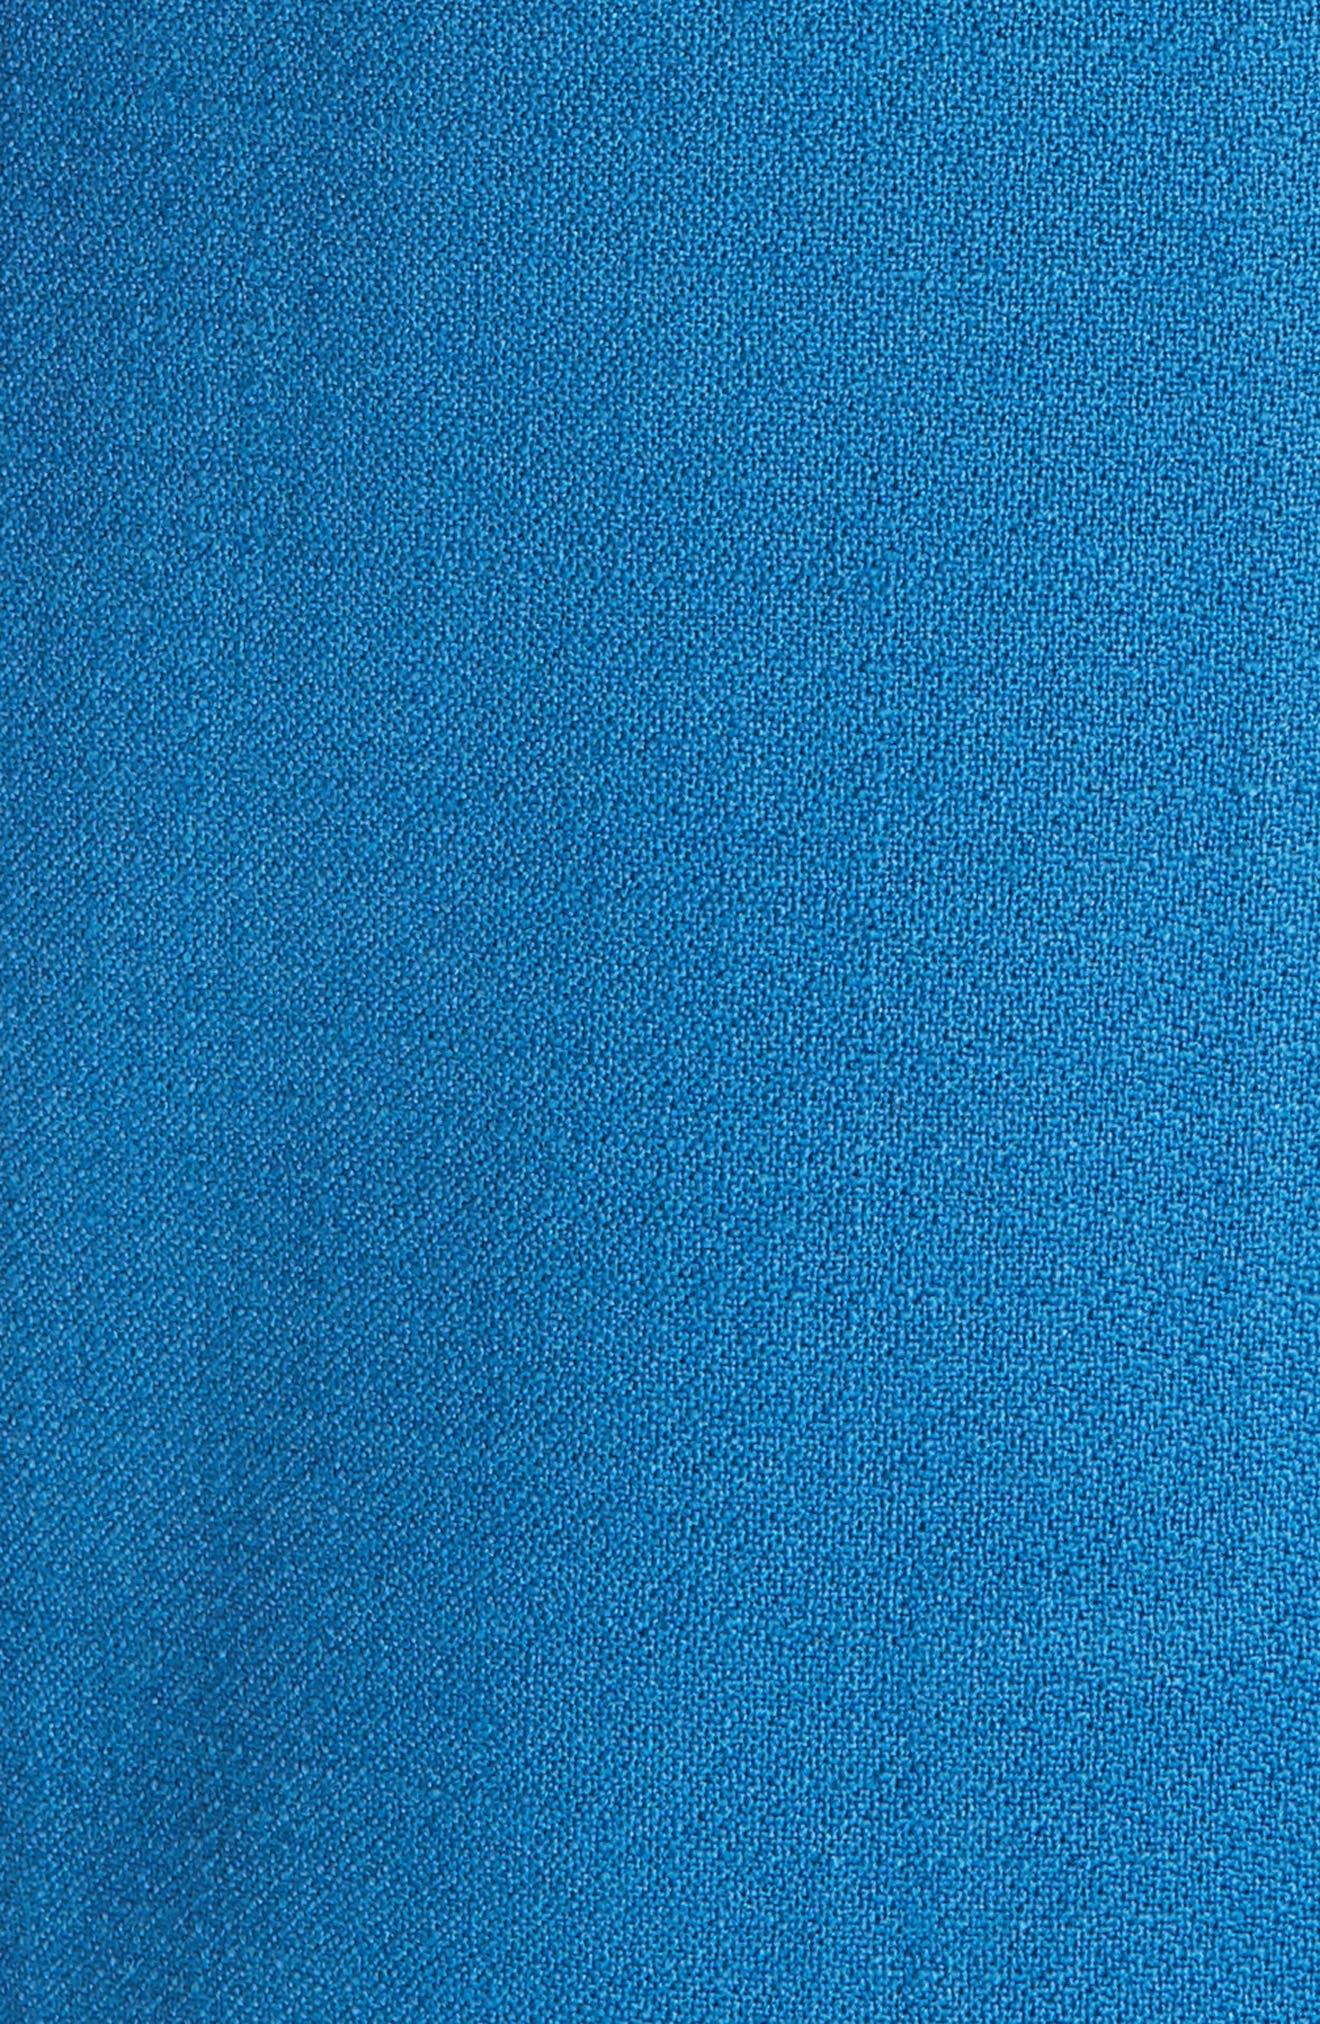 Peaked Lapel Wool Blend Coat,                             Alternate thumbnail 6, color,                             470